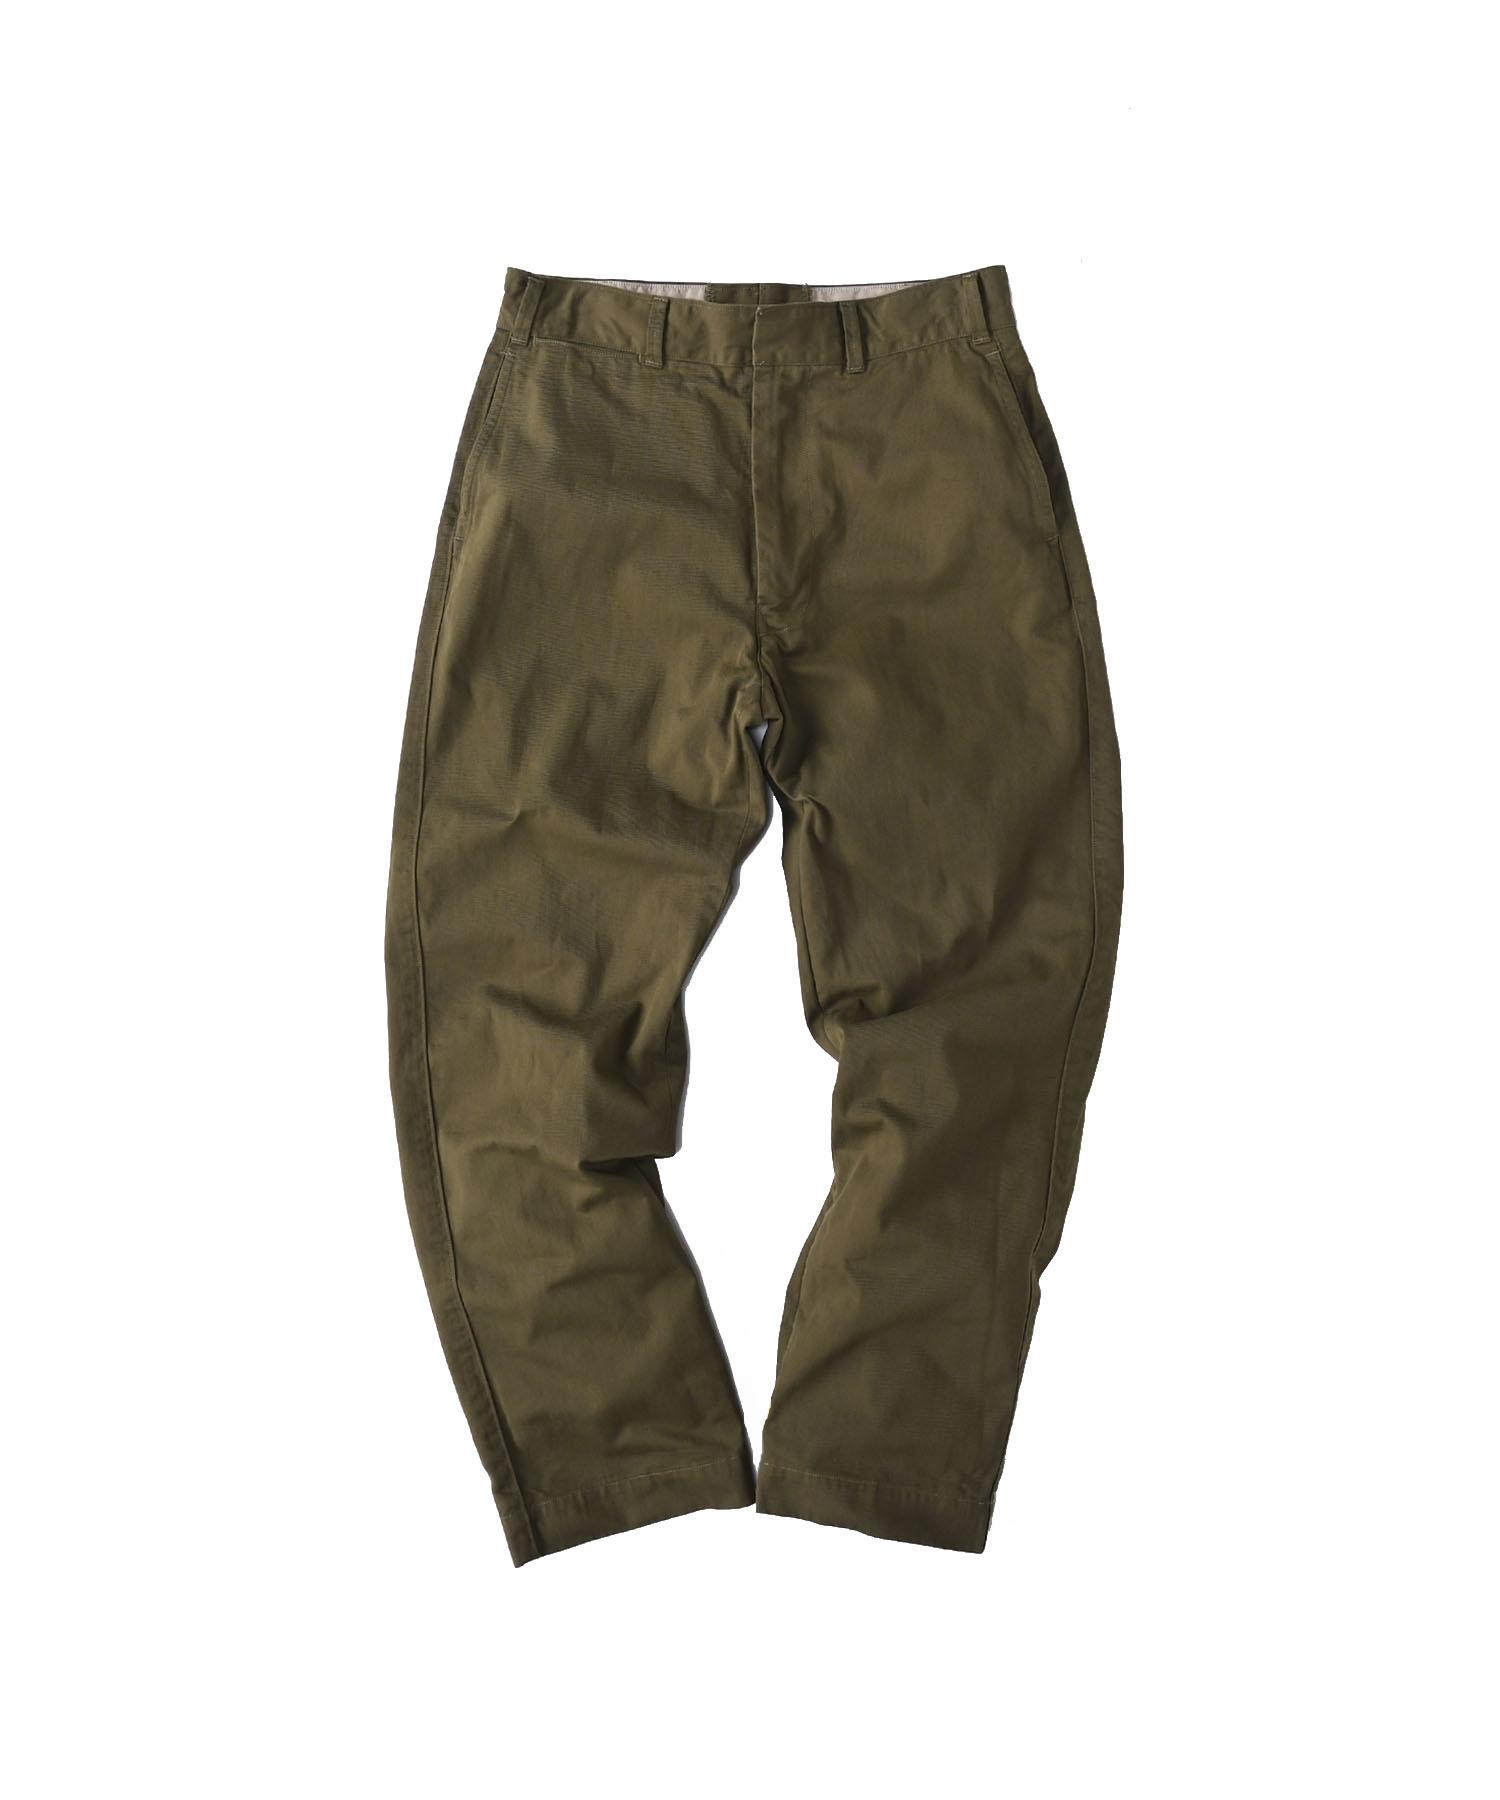 Okome Chino 908 Pants (0421)-2